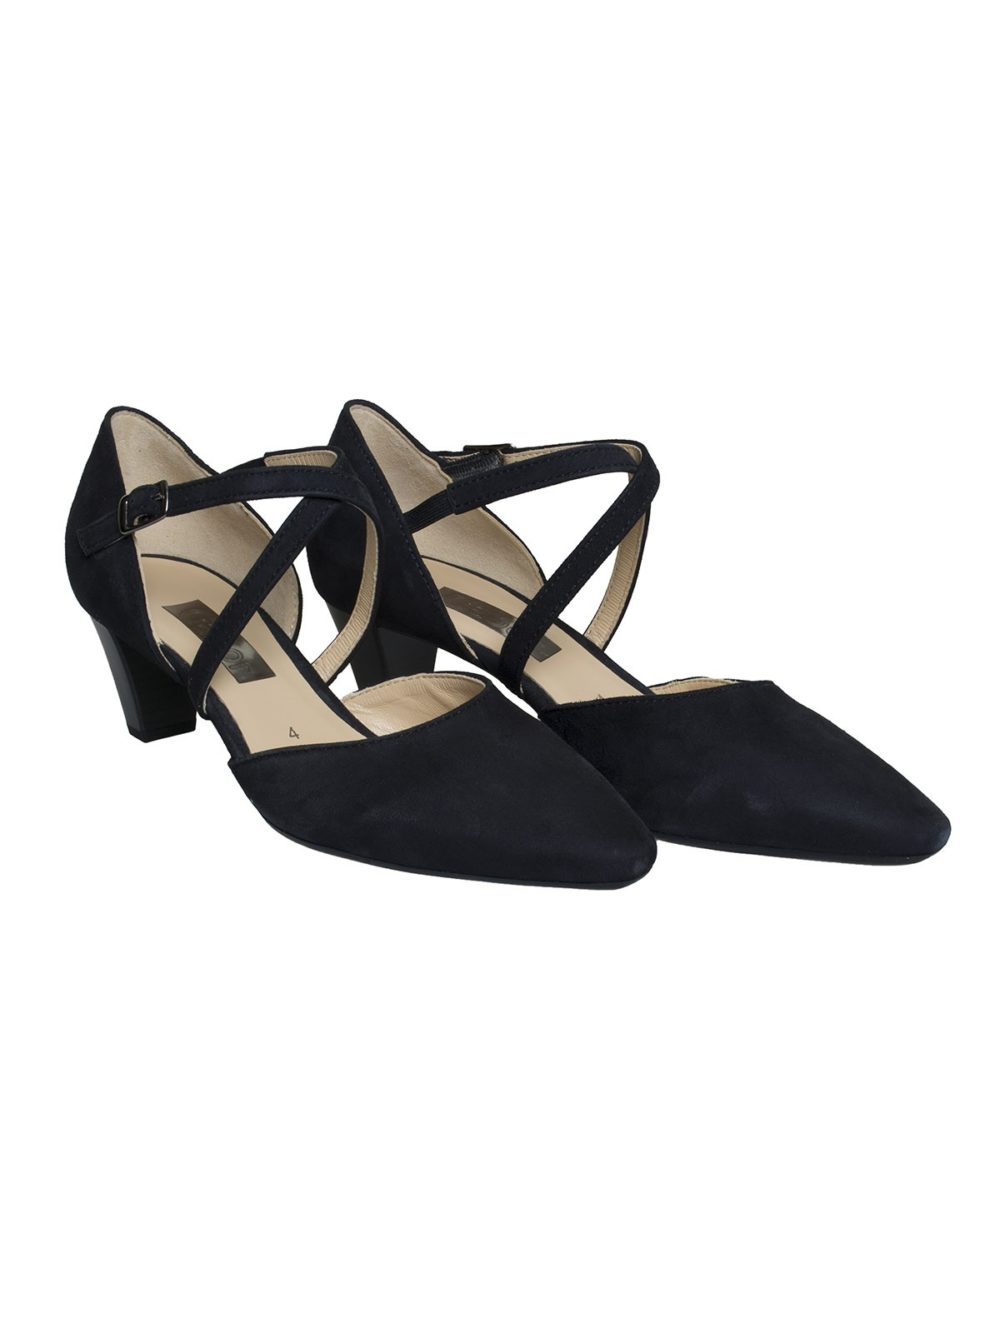 Callow Shoe Gabor Shoes Katie Kerr Women's shoes